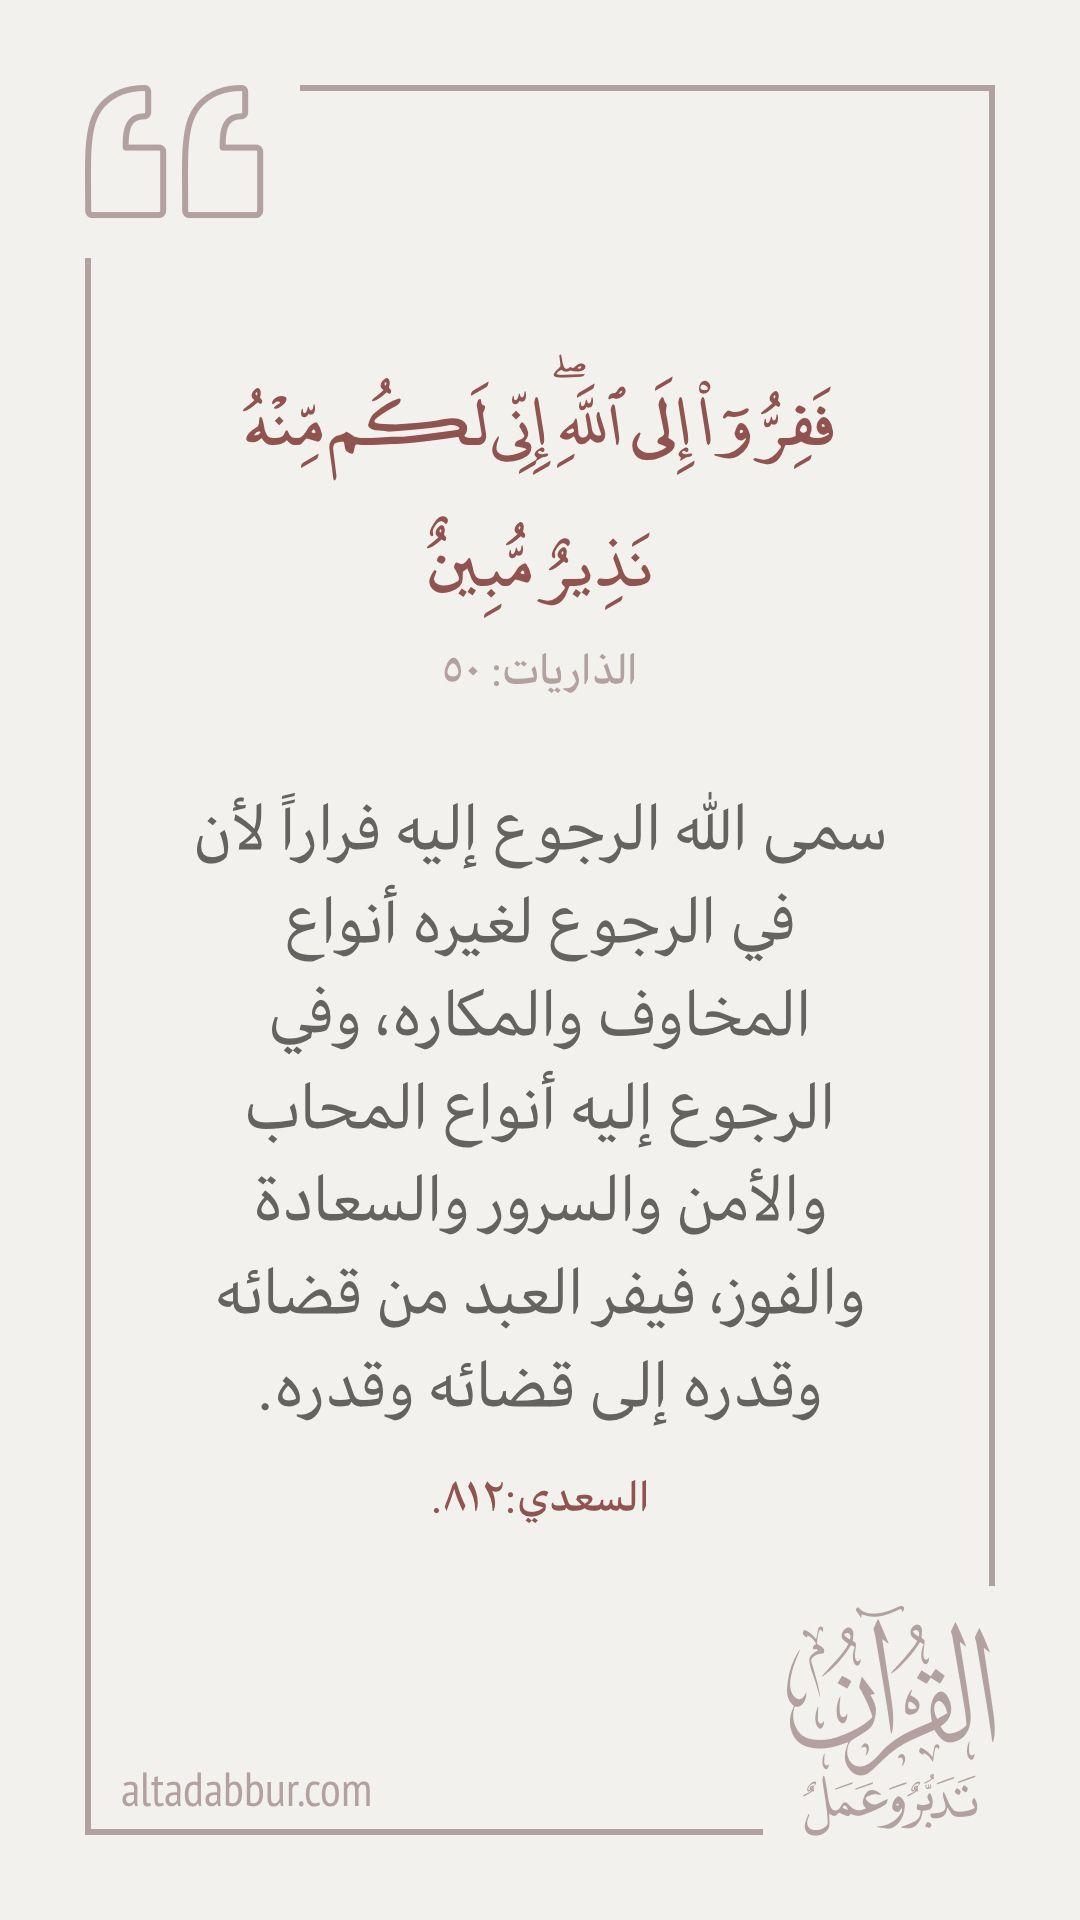 Pin By Nina Nes On قرآن تفسير وتدب ر Islamic Phrases Quran Tafseer Phrase